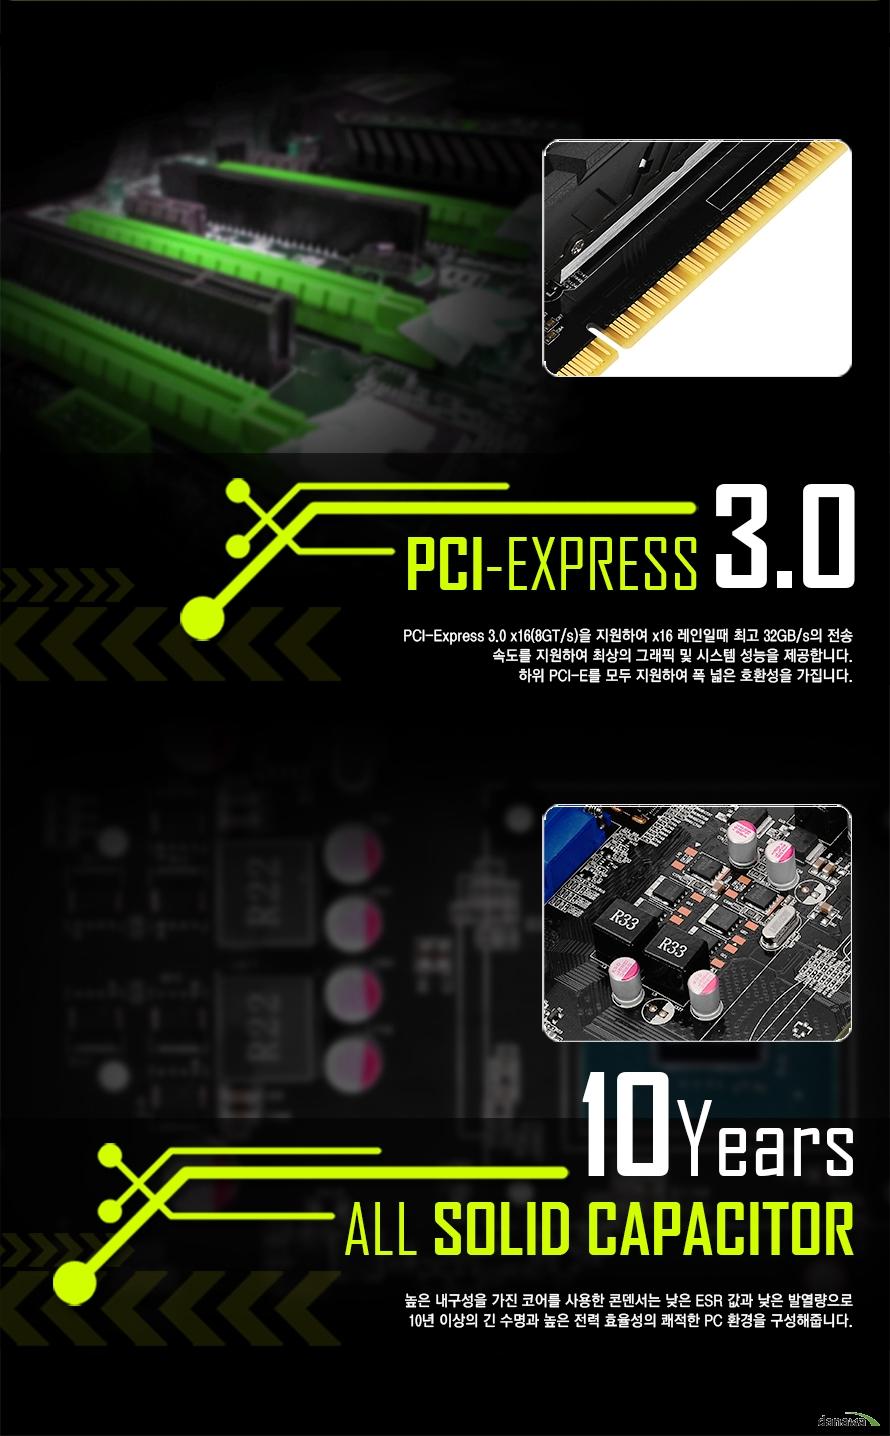 PCI-EXPRESS 3.0PCI-Express 3.0 x16을 지원하여 x16 레인일때 최고 32GB/s의 전송속도를 지원하여 최상의 그래픽 및 시스템 성능을 제공합니다.하위 PCI-E를 모두 지원하여 폭 넓은 호환성을 가집니다.10Years ALL SOLID CAPACITOR높은 내구성을 가진 코어를 사용한 콘덴서는 낮은 ESR 값과 낮은 발열량으로긴 수명과 높은 전력 효율성의 쾌적한 PC 환경을 구성해줍니다.